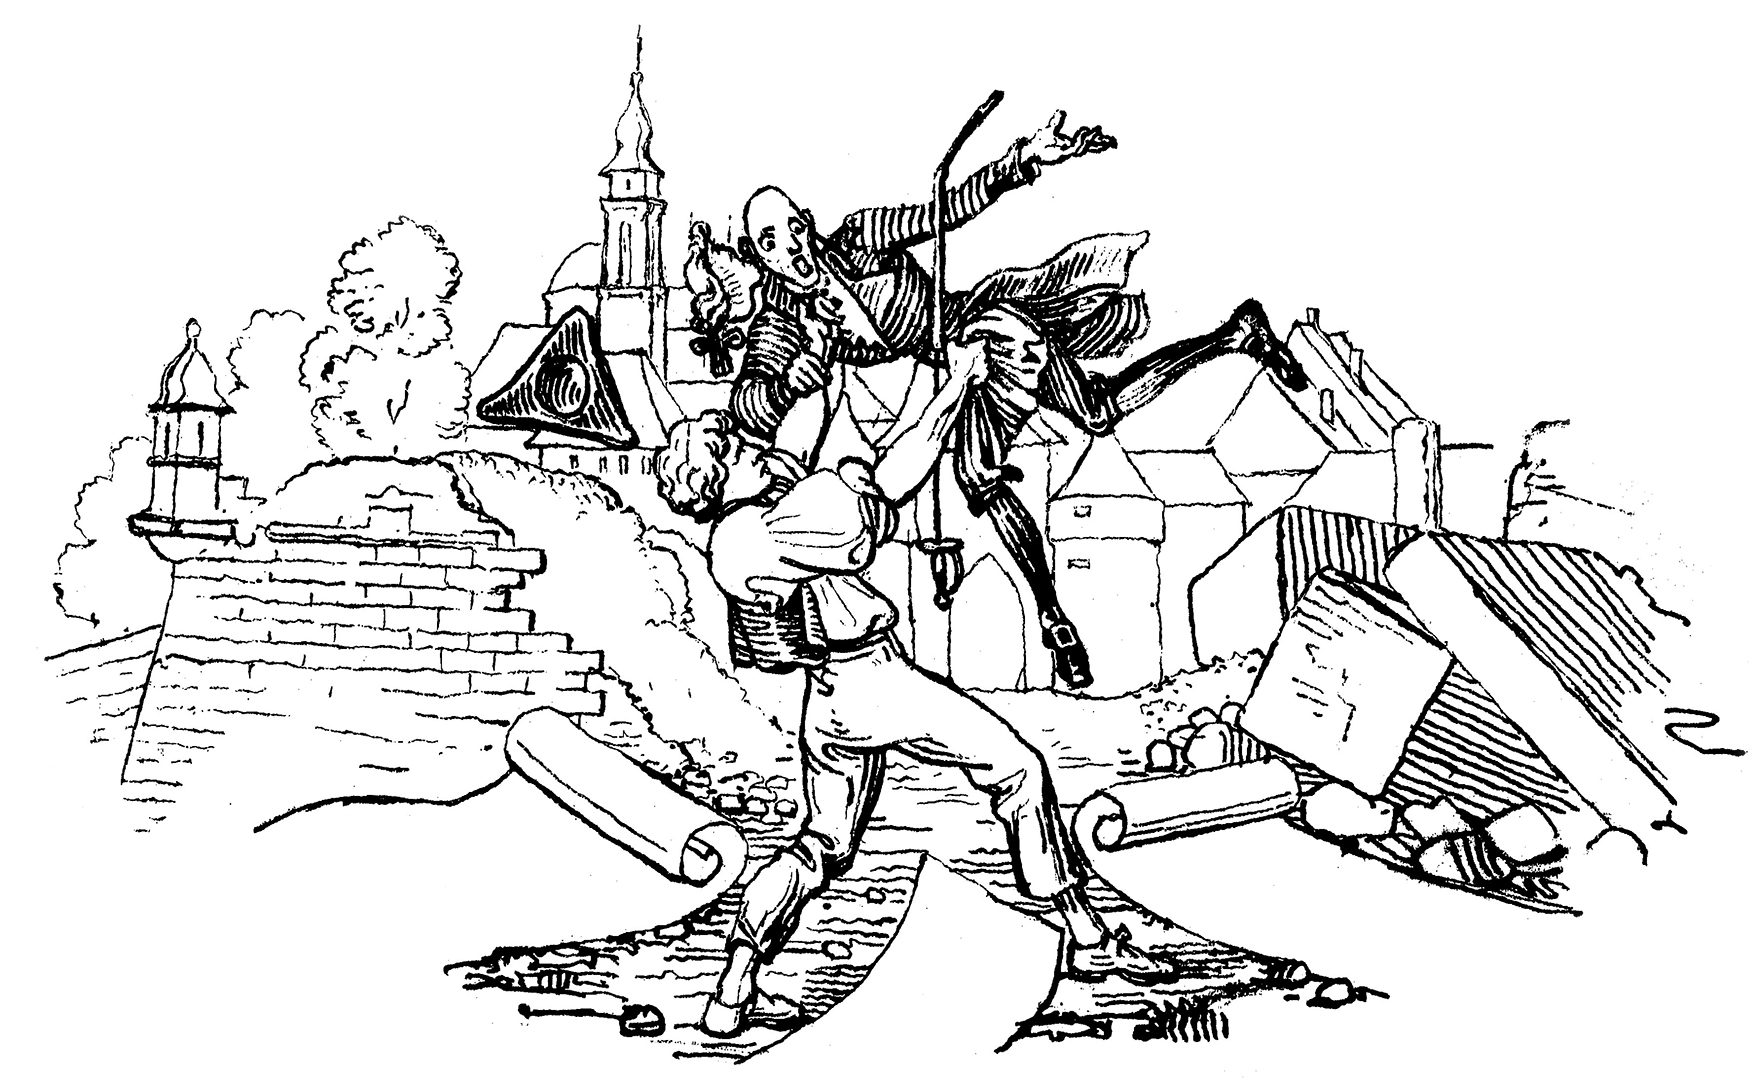 Martin Disteli, Aristokratenhosenlupf, um 1839.